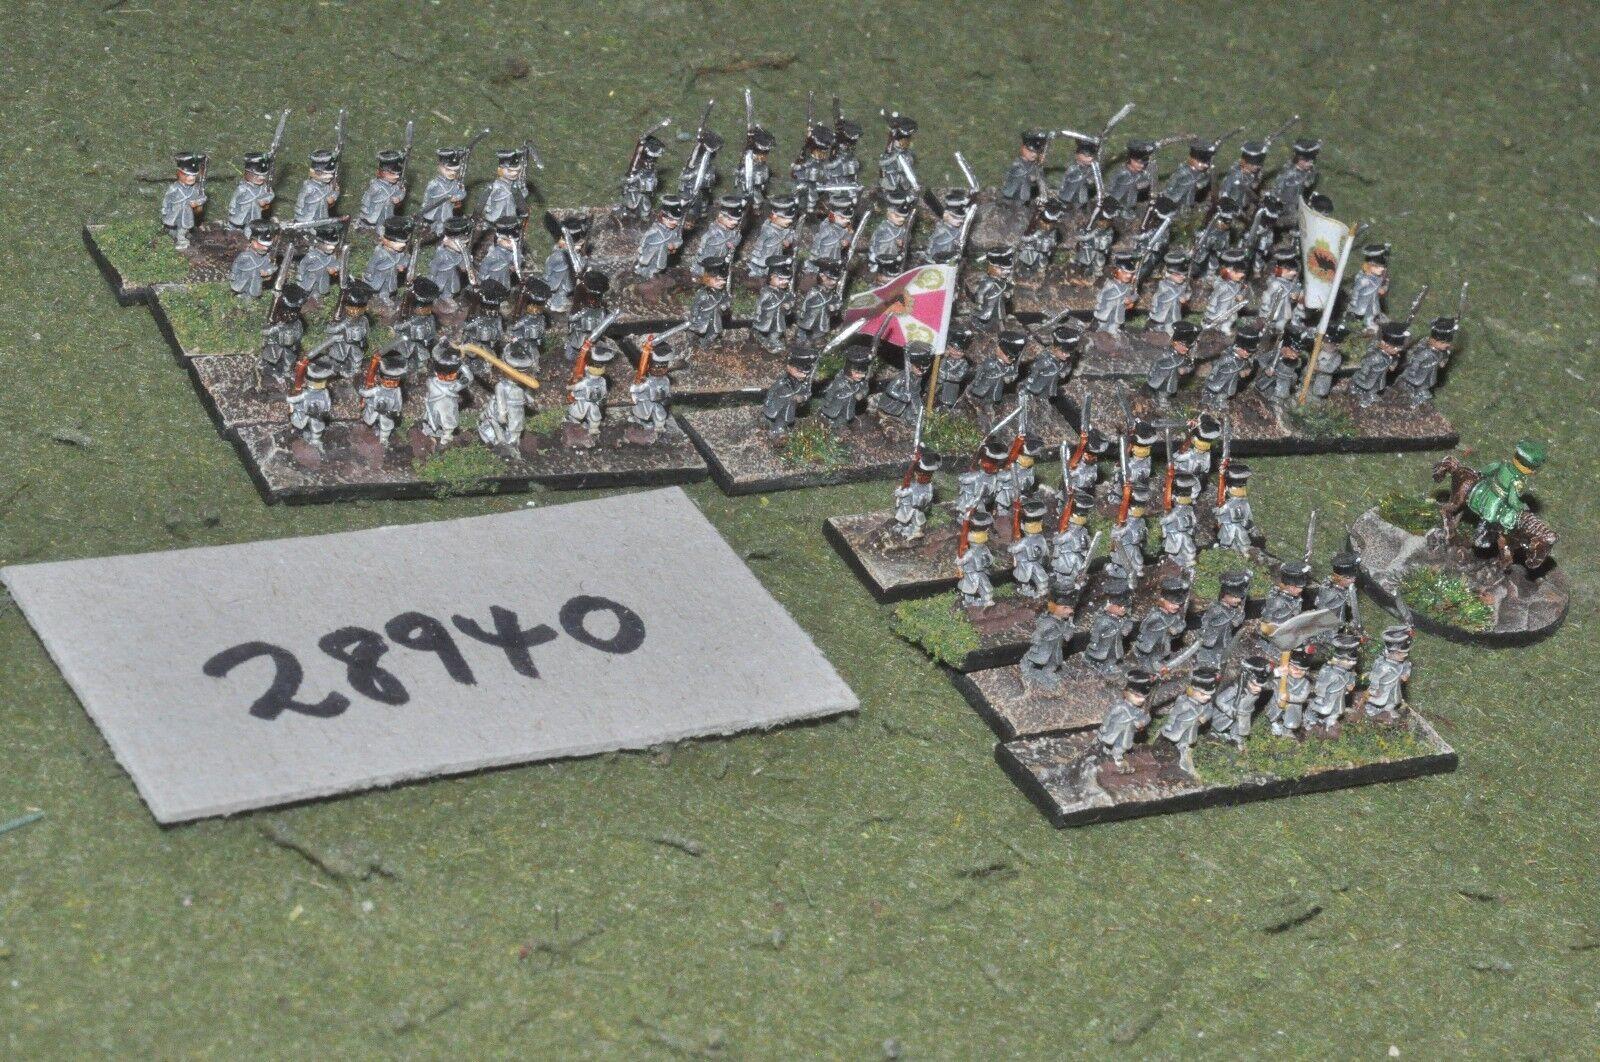 6mm napoleonic   Russian - adler 100 figures - inf (28940)